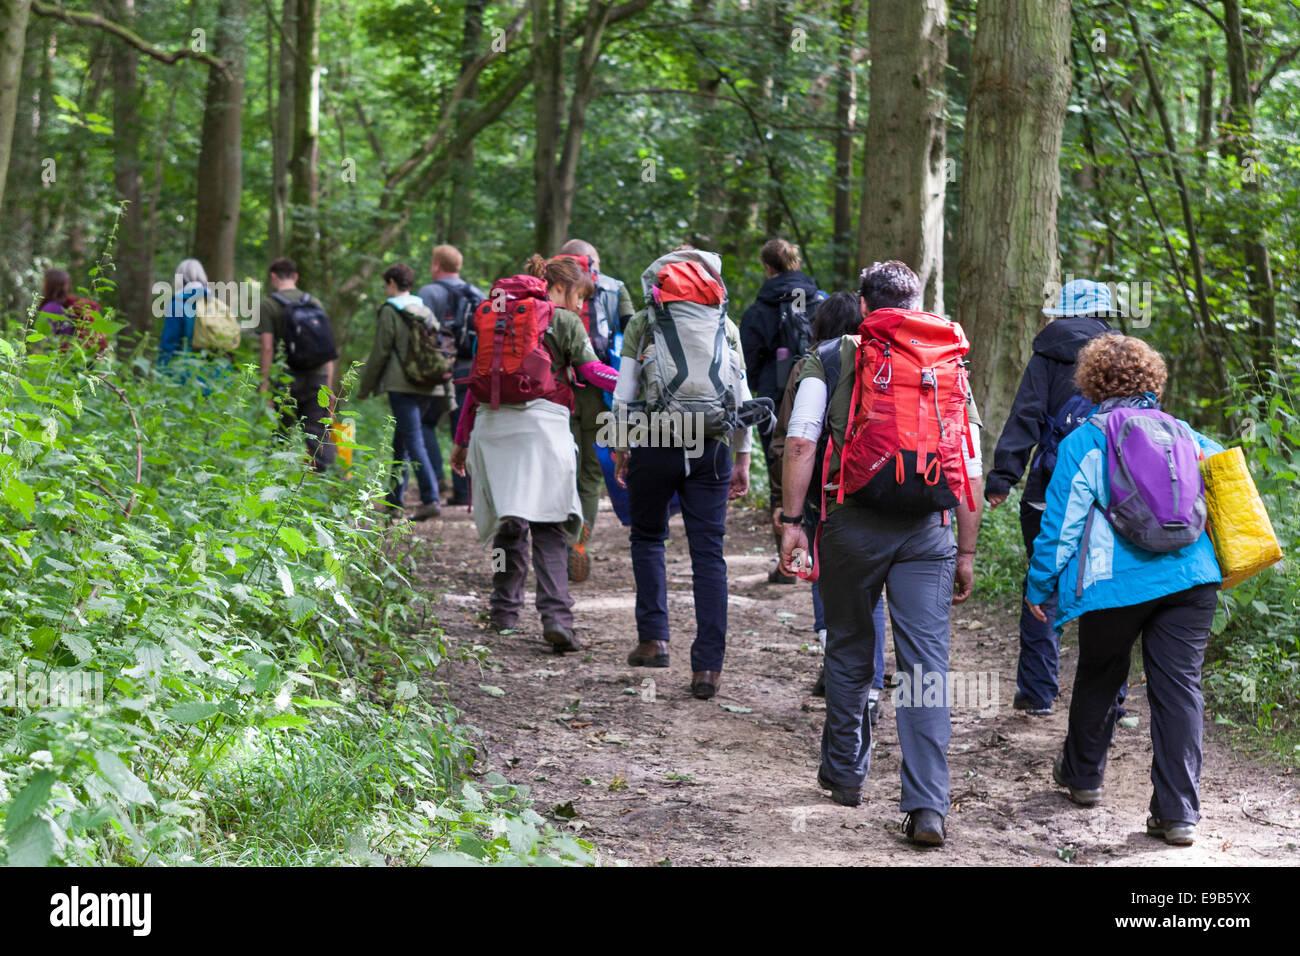 Group of people walking along forest path, [Wytham Woods], Oxfordshire, UK - Stock Image